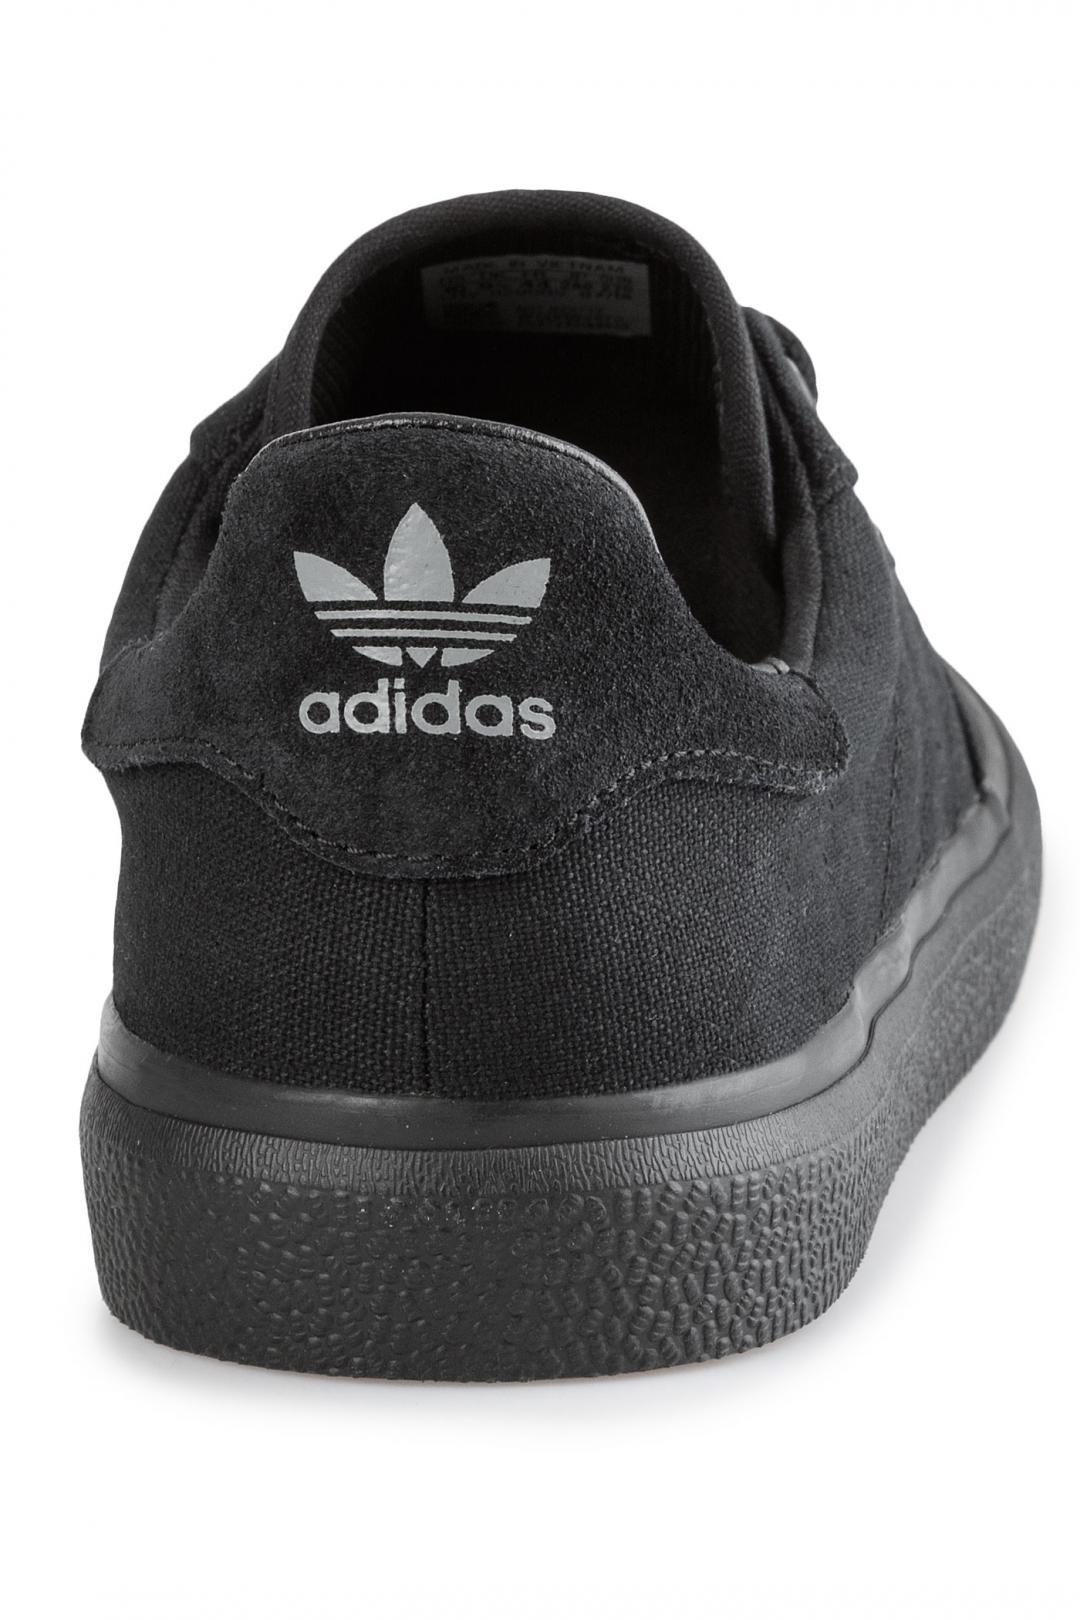 Uomo adidas Skateboarding 3MC Suede core black core black grey | Scarpe da skate